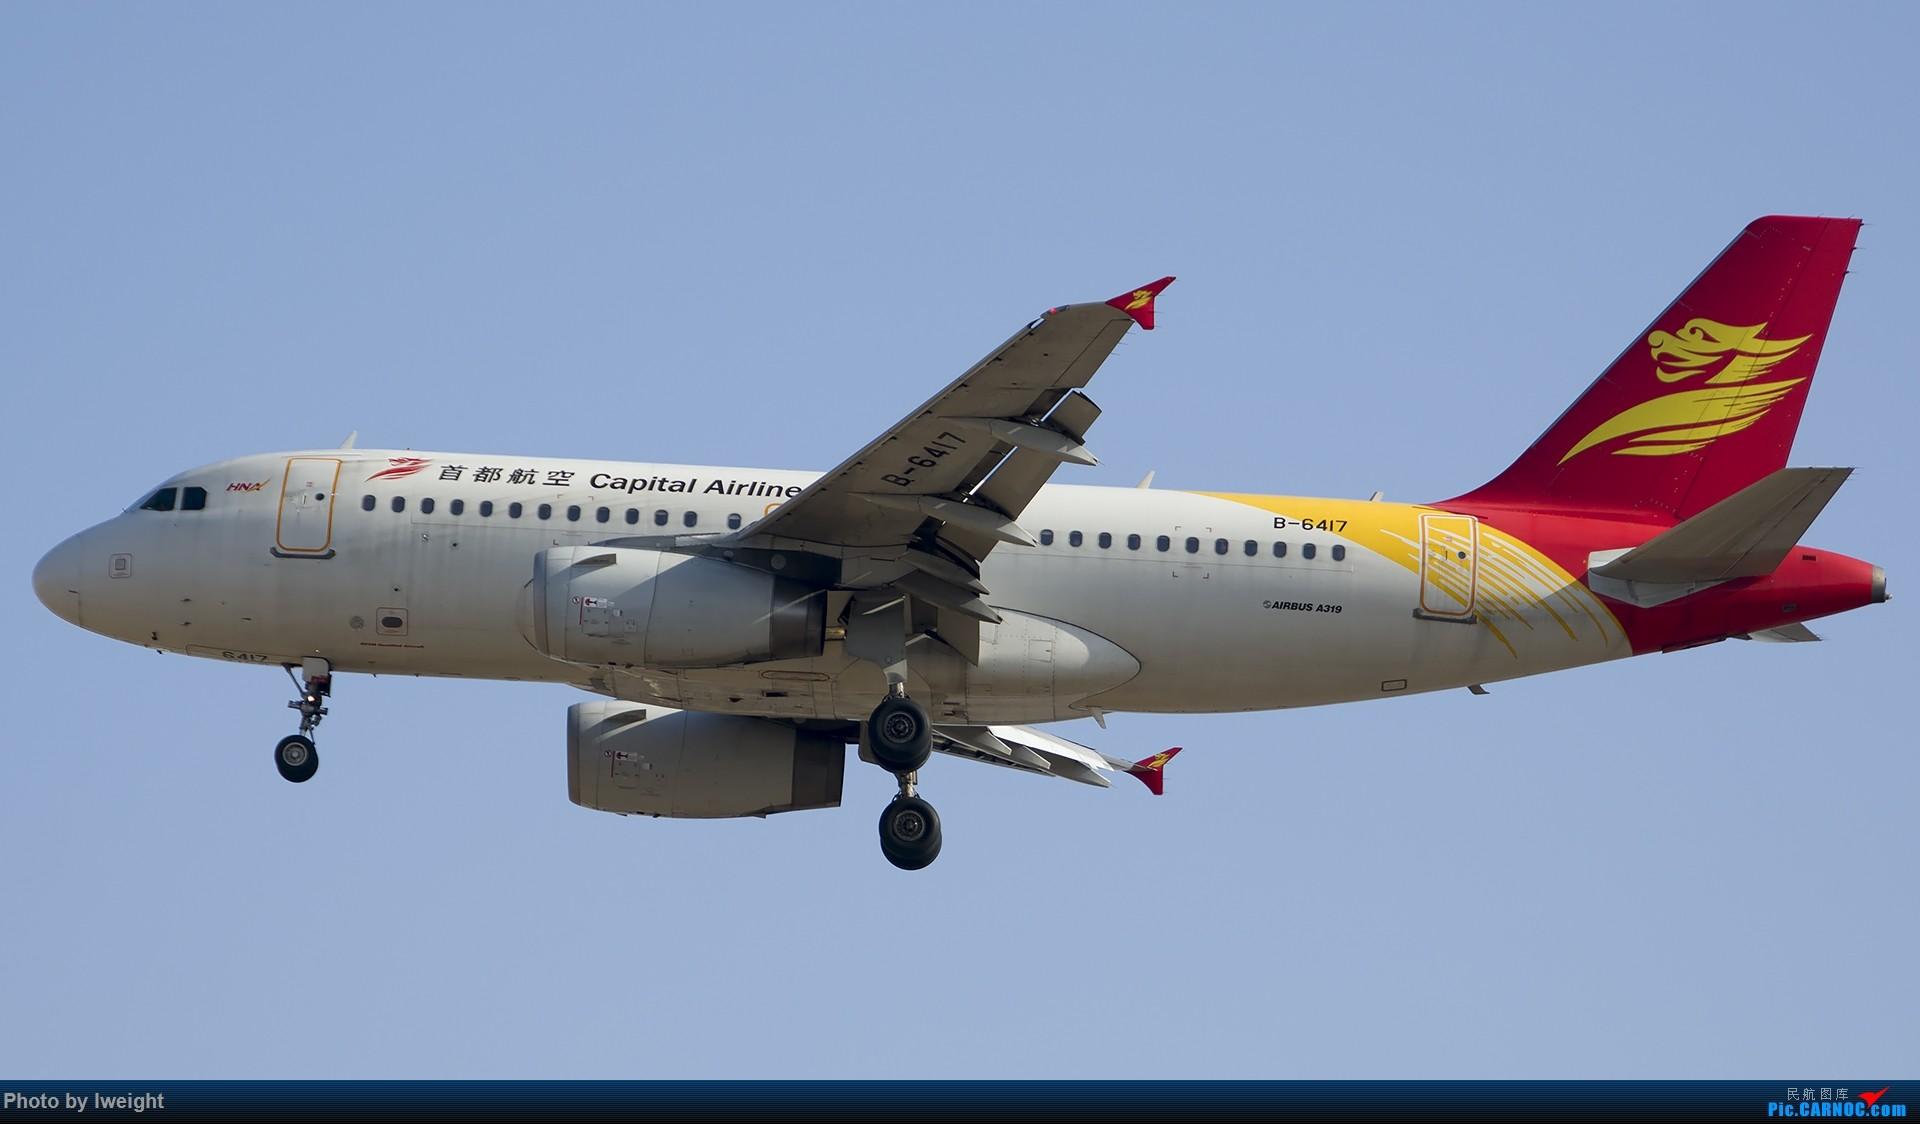 Re:[原创]庆祝升级777,发上今天在首都机场拍的所有飞机【2014-12-14】 AIRBUS A319-100 B-6417 中国北京首都国际机场